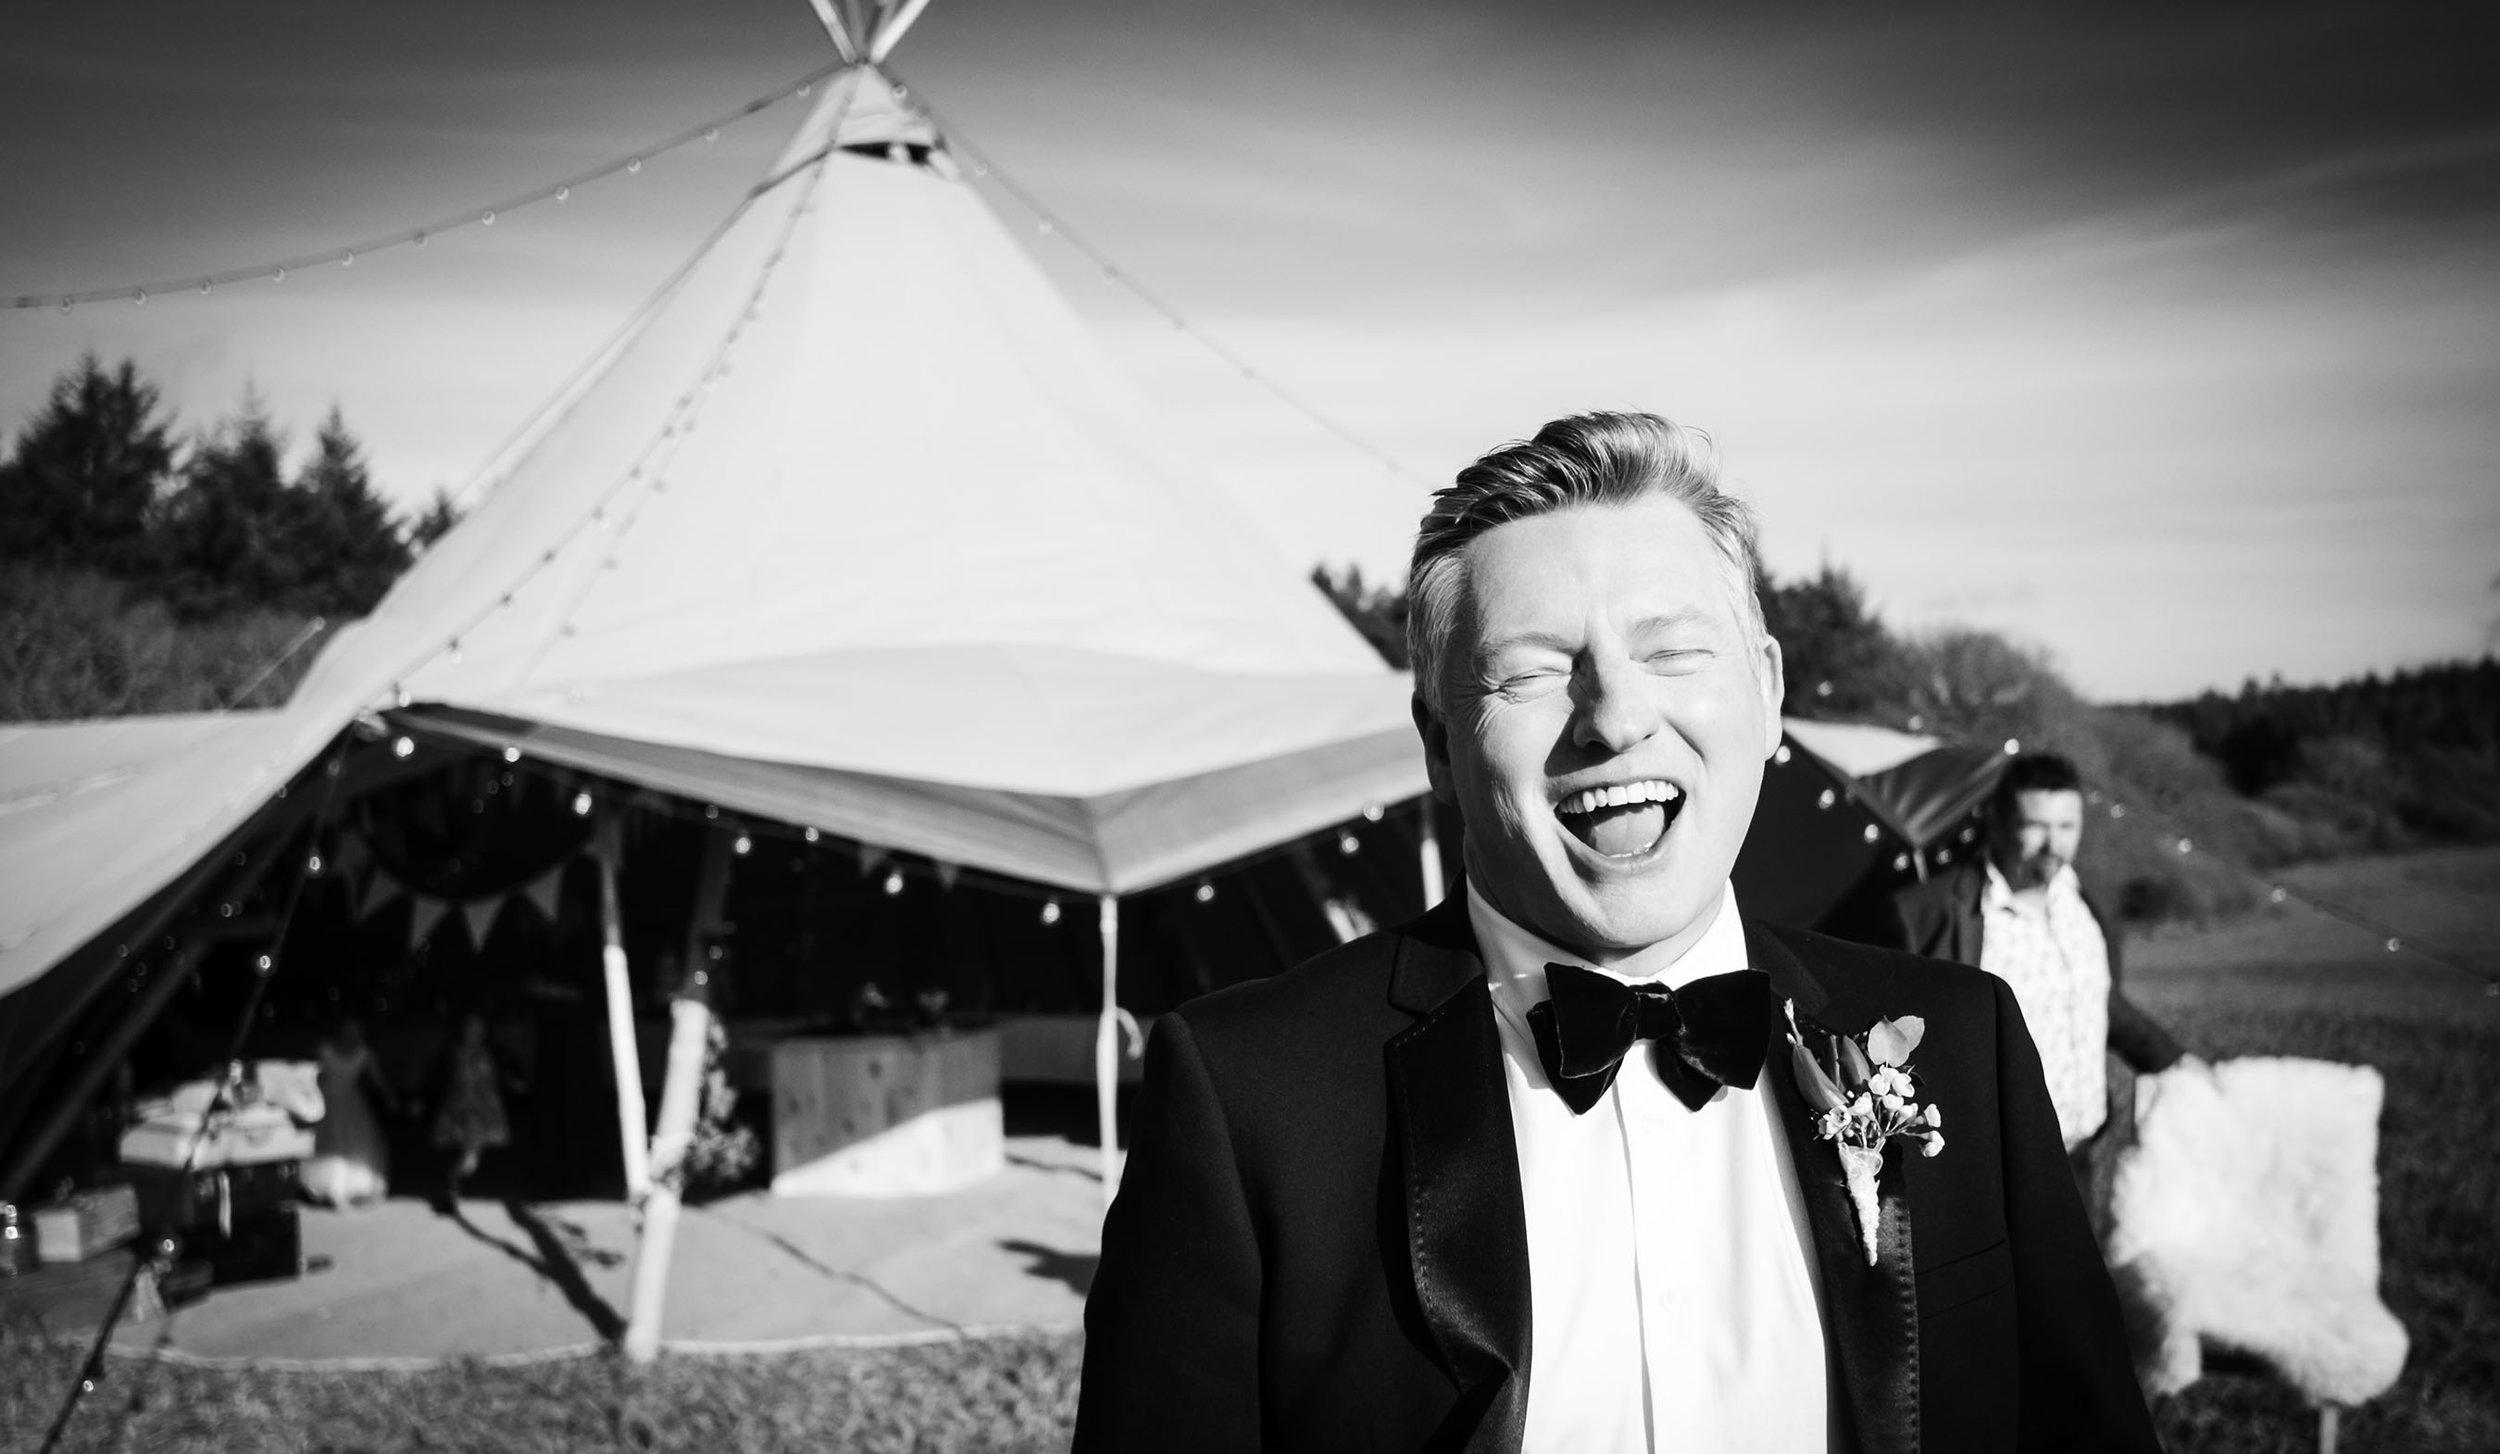 Cornwall groom